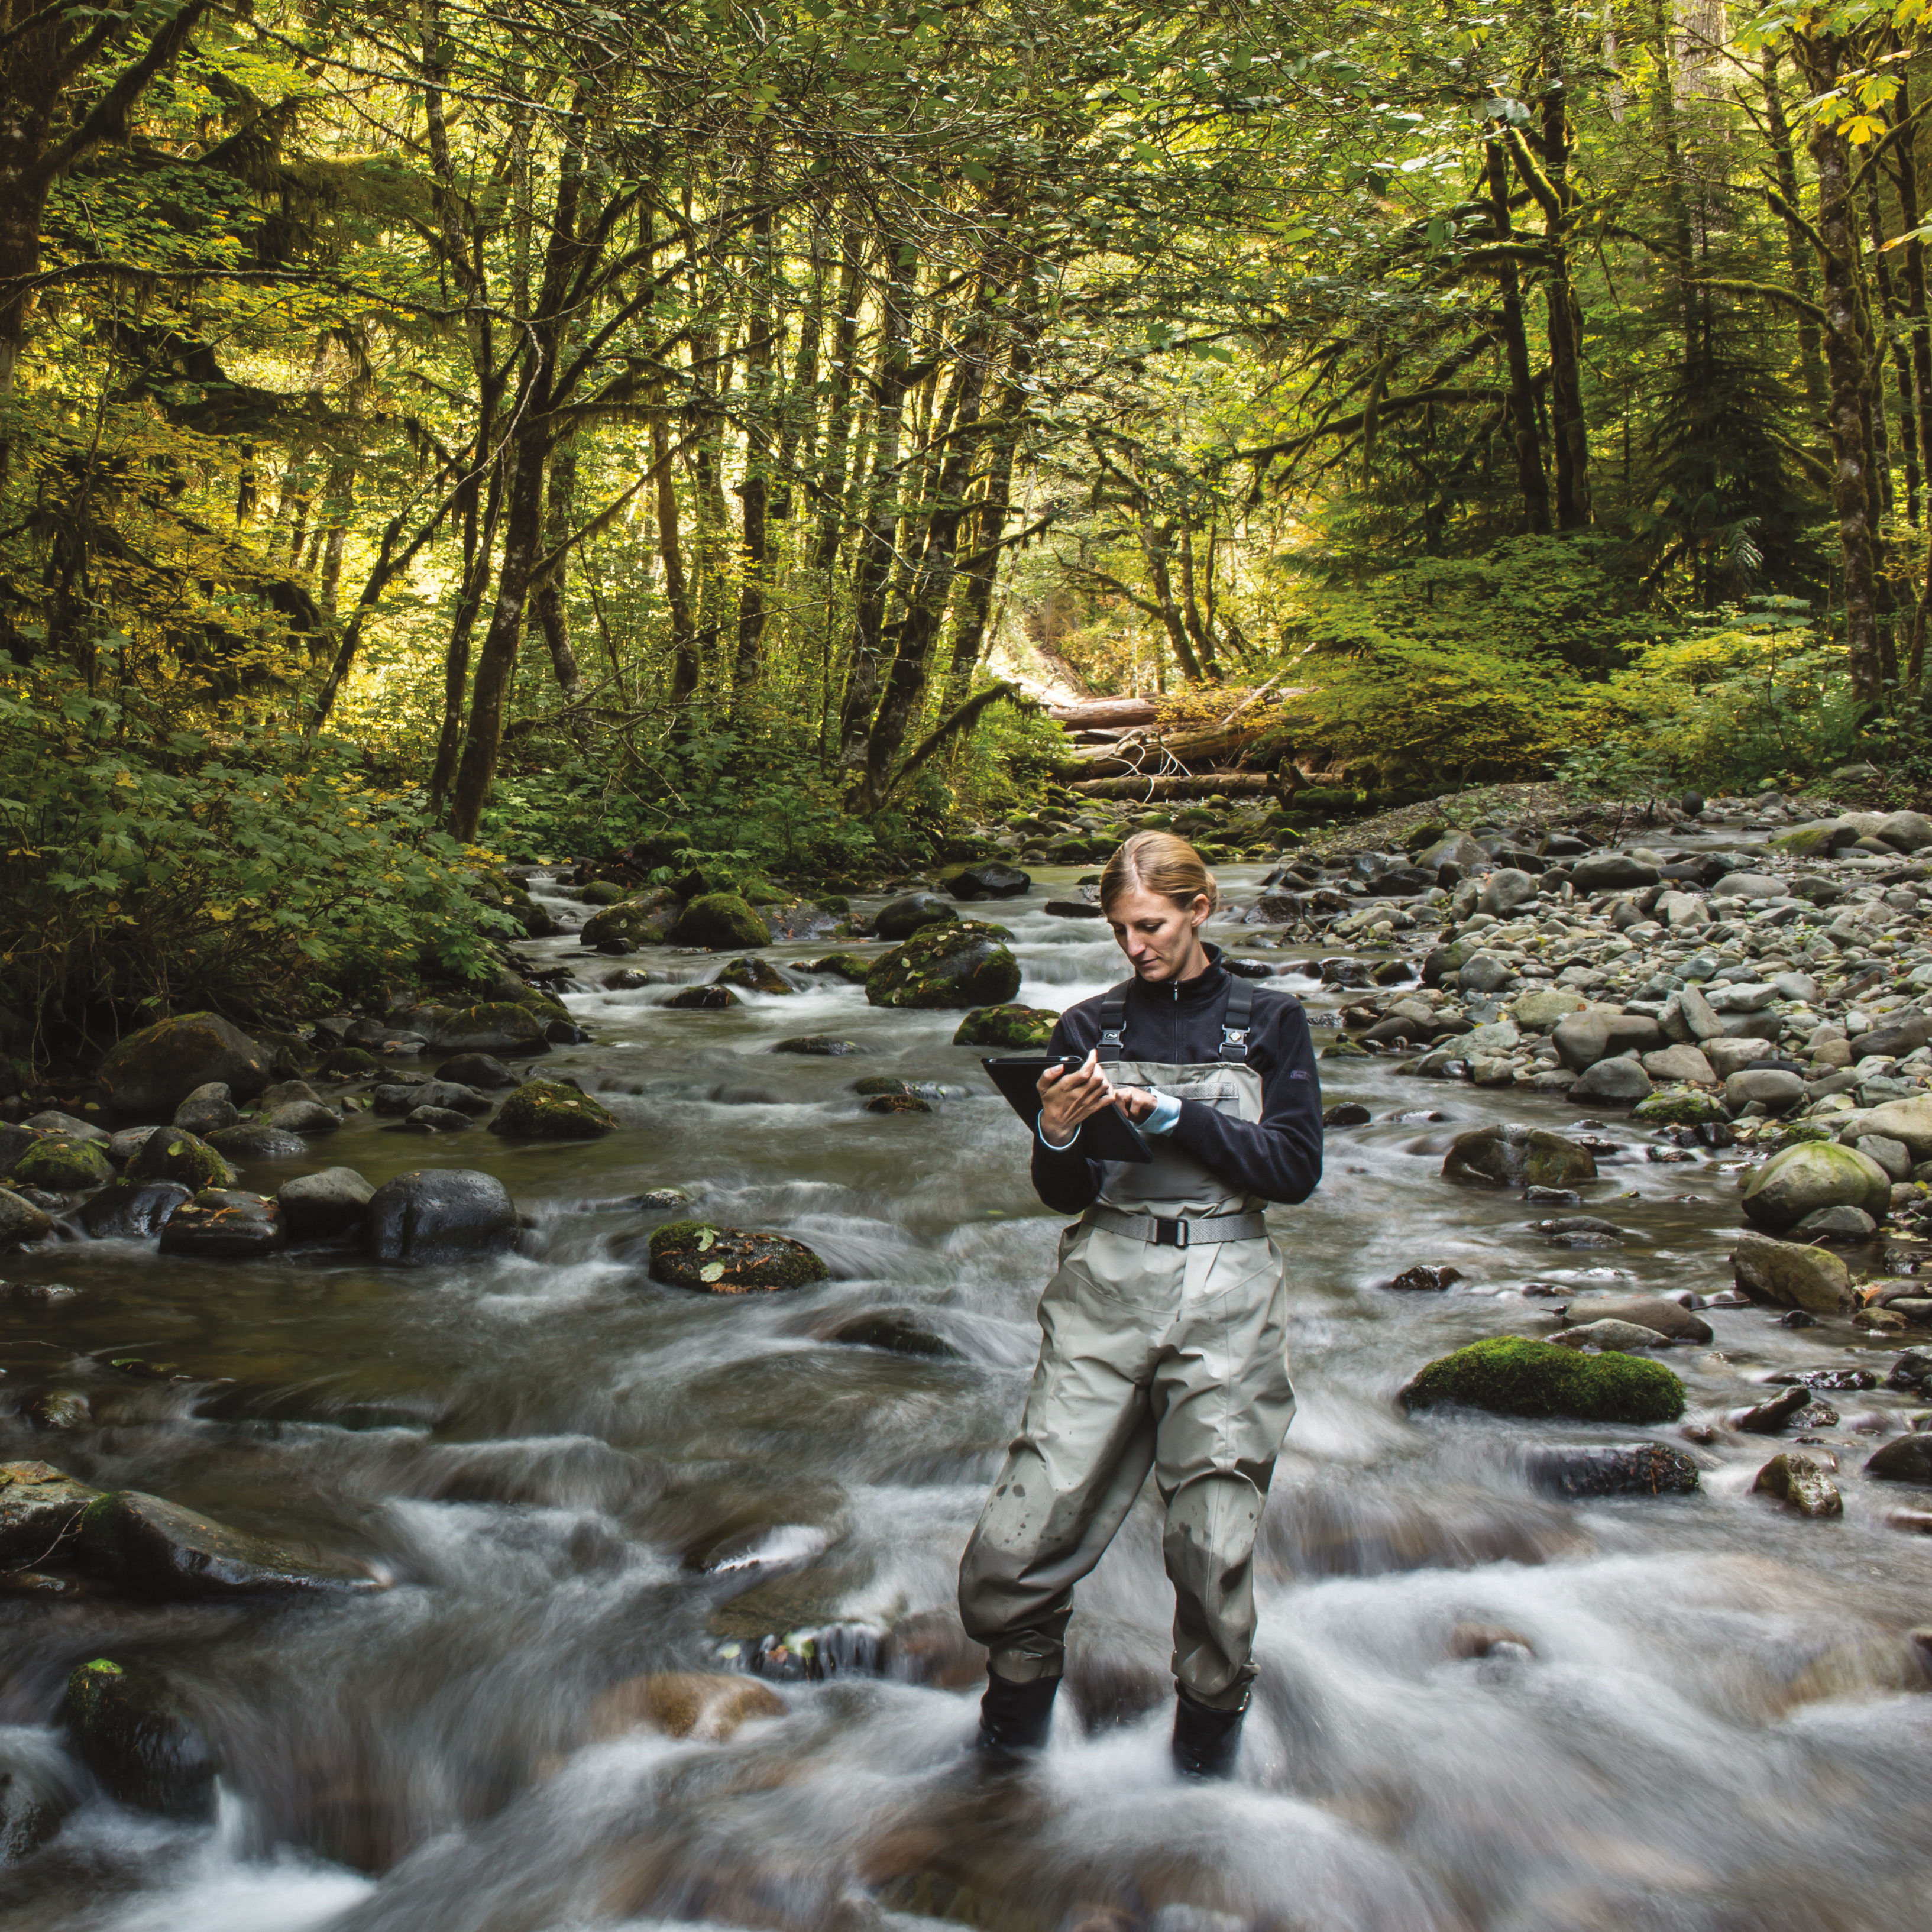 Freshwater trust zw5tnr